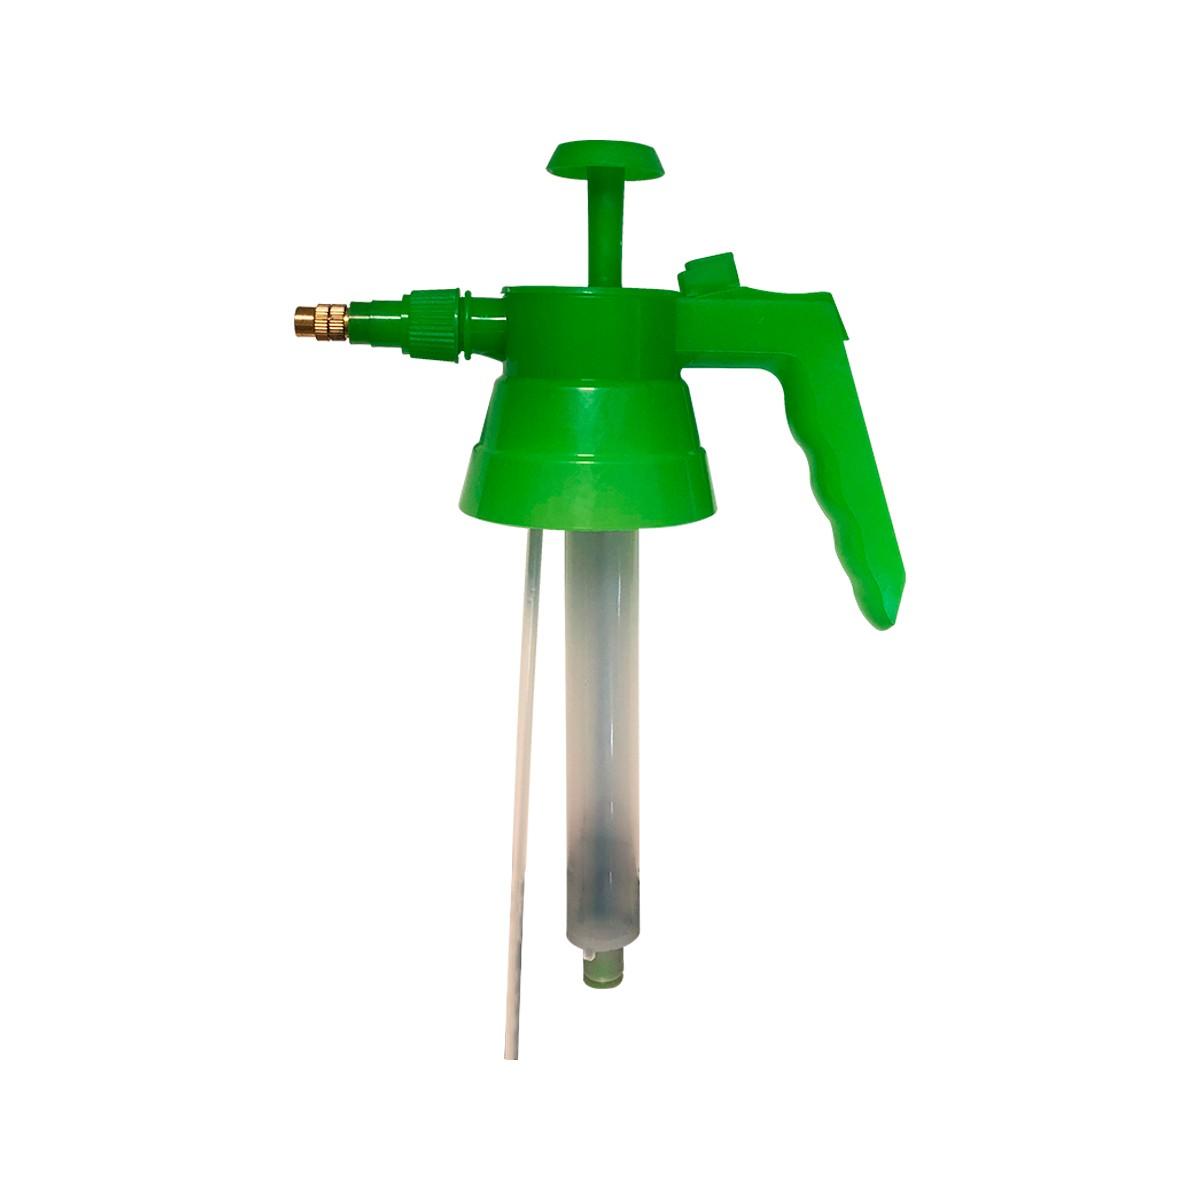 Pressurizador Pulverizador Manual Pressão Acumulada 2 Litros SAPPA2L SuperAgri